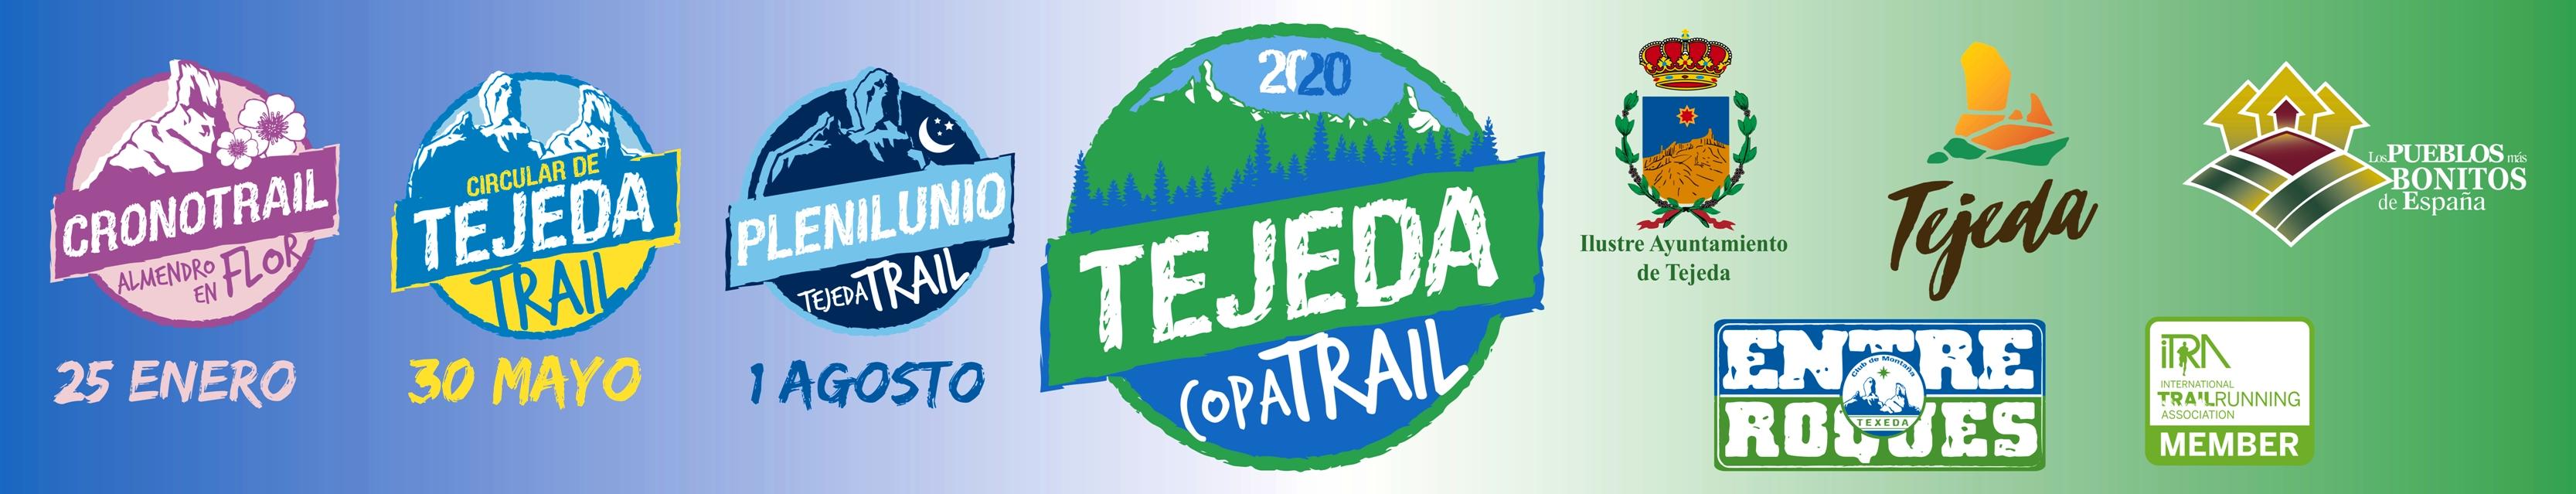 Tejeda Copa Trail